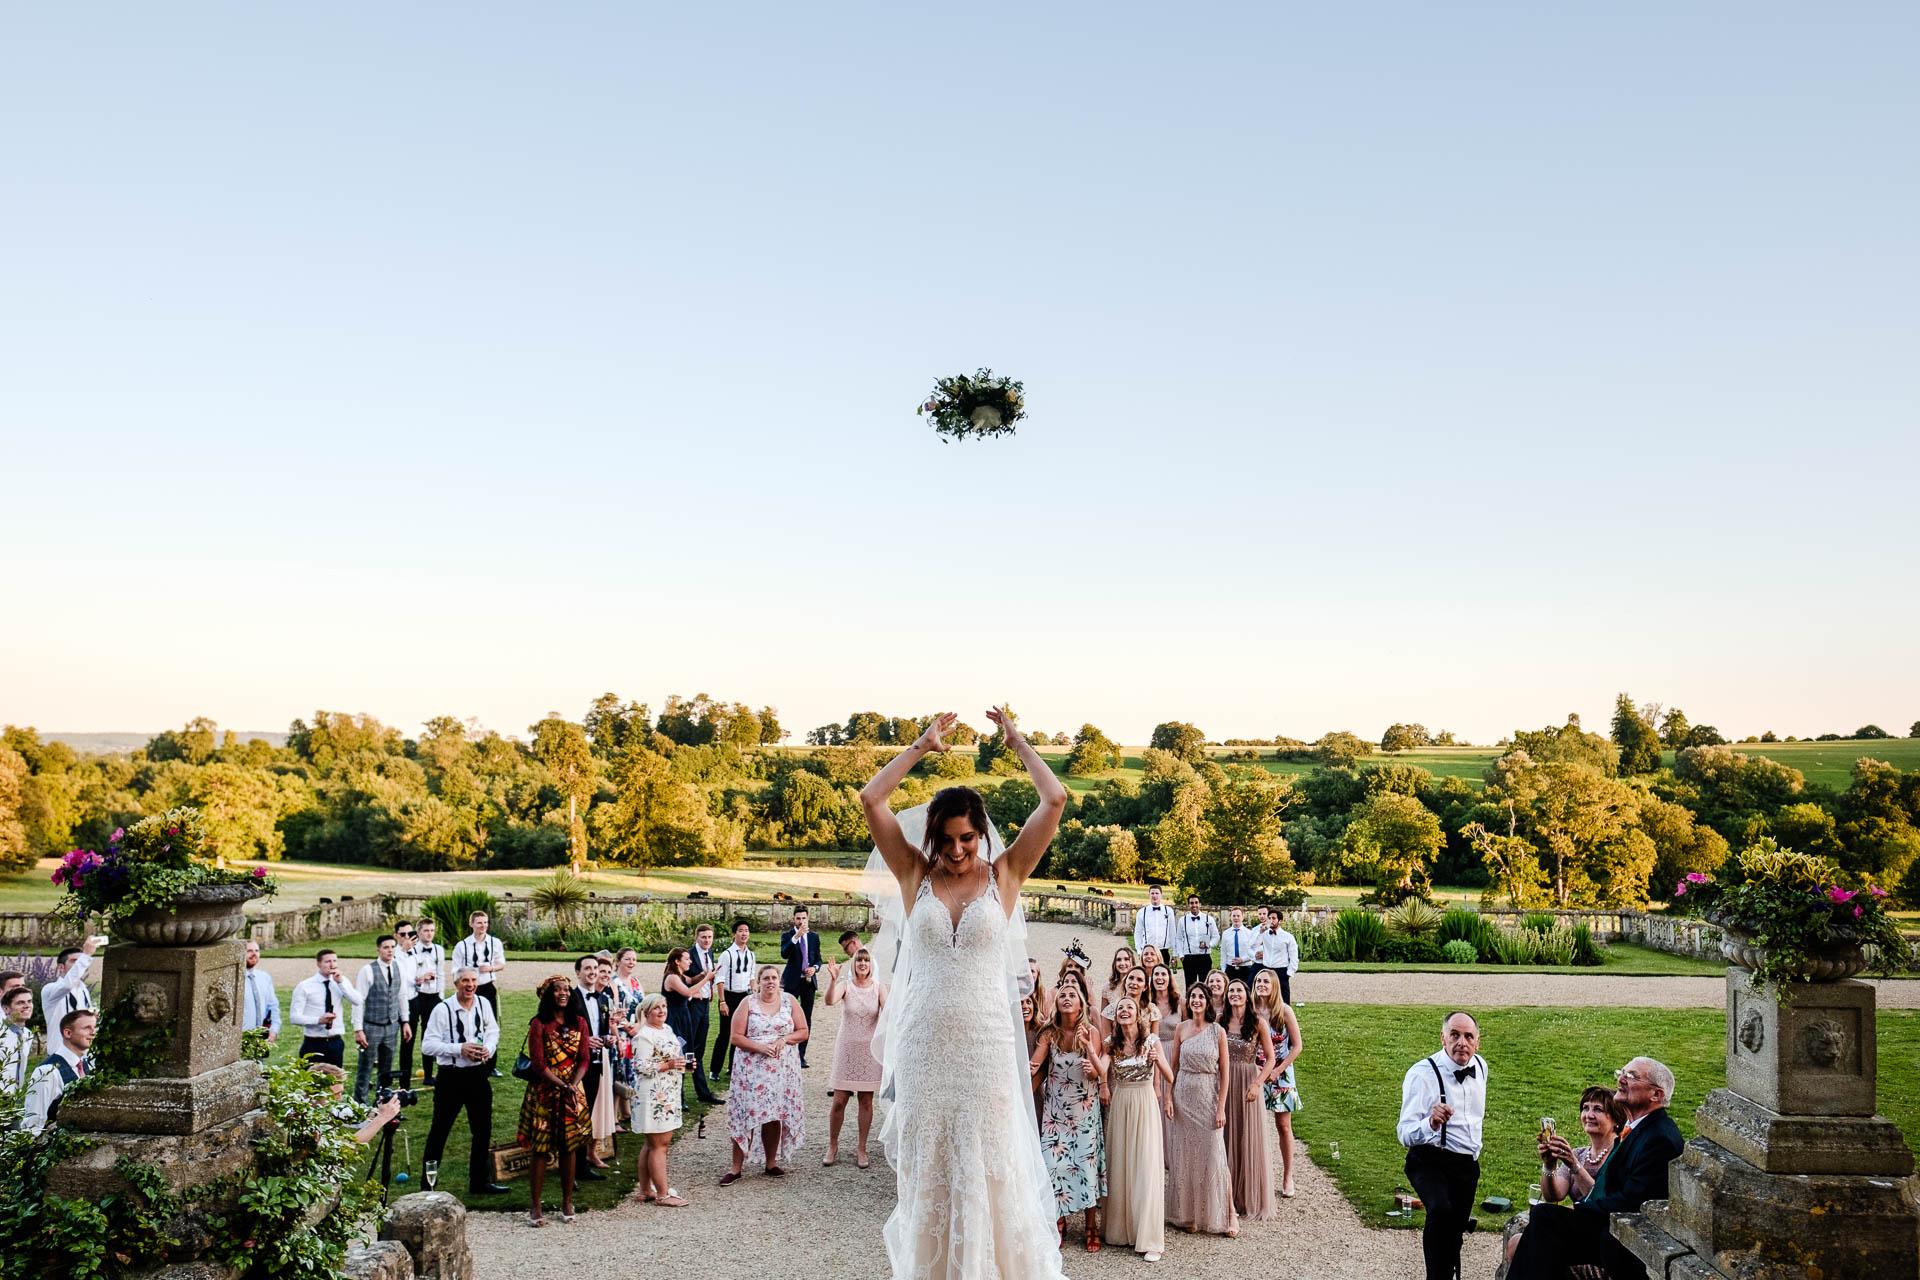 orchardleigh house wedding - Danni & Barney (469).jpg